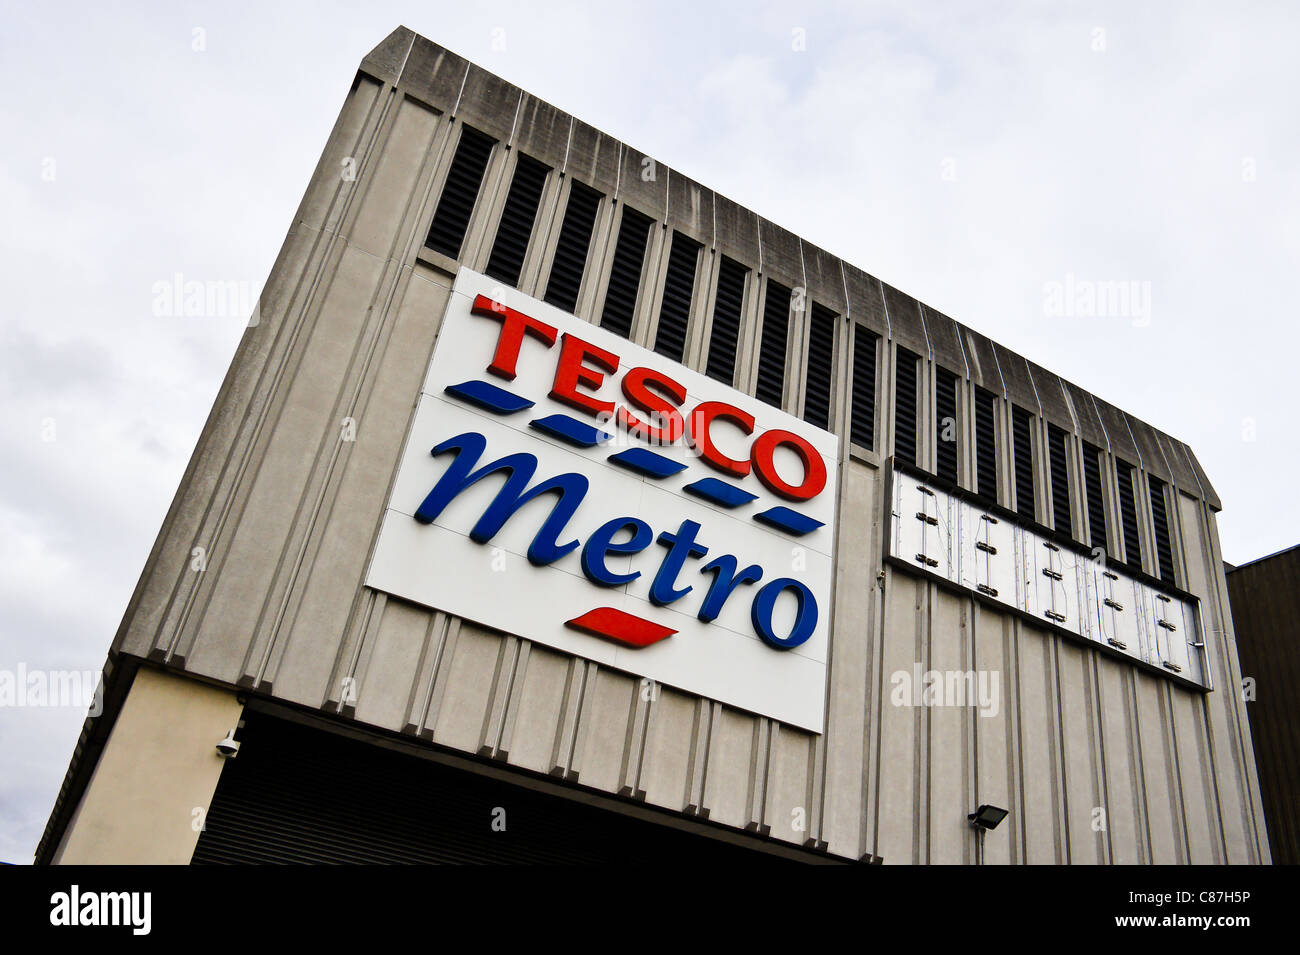 Tesco metro in Harlow, Essex - Stock Image